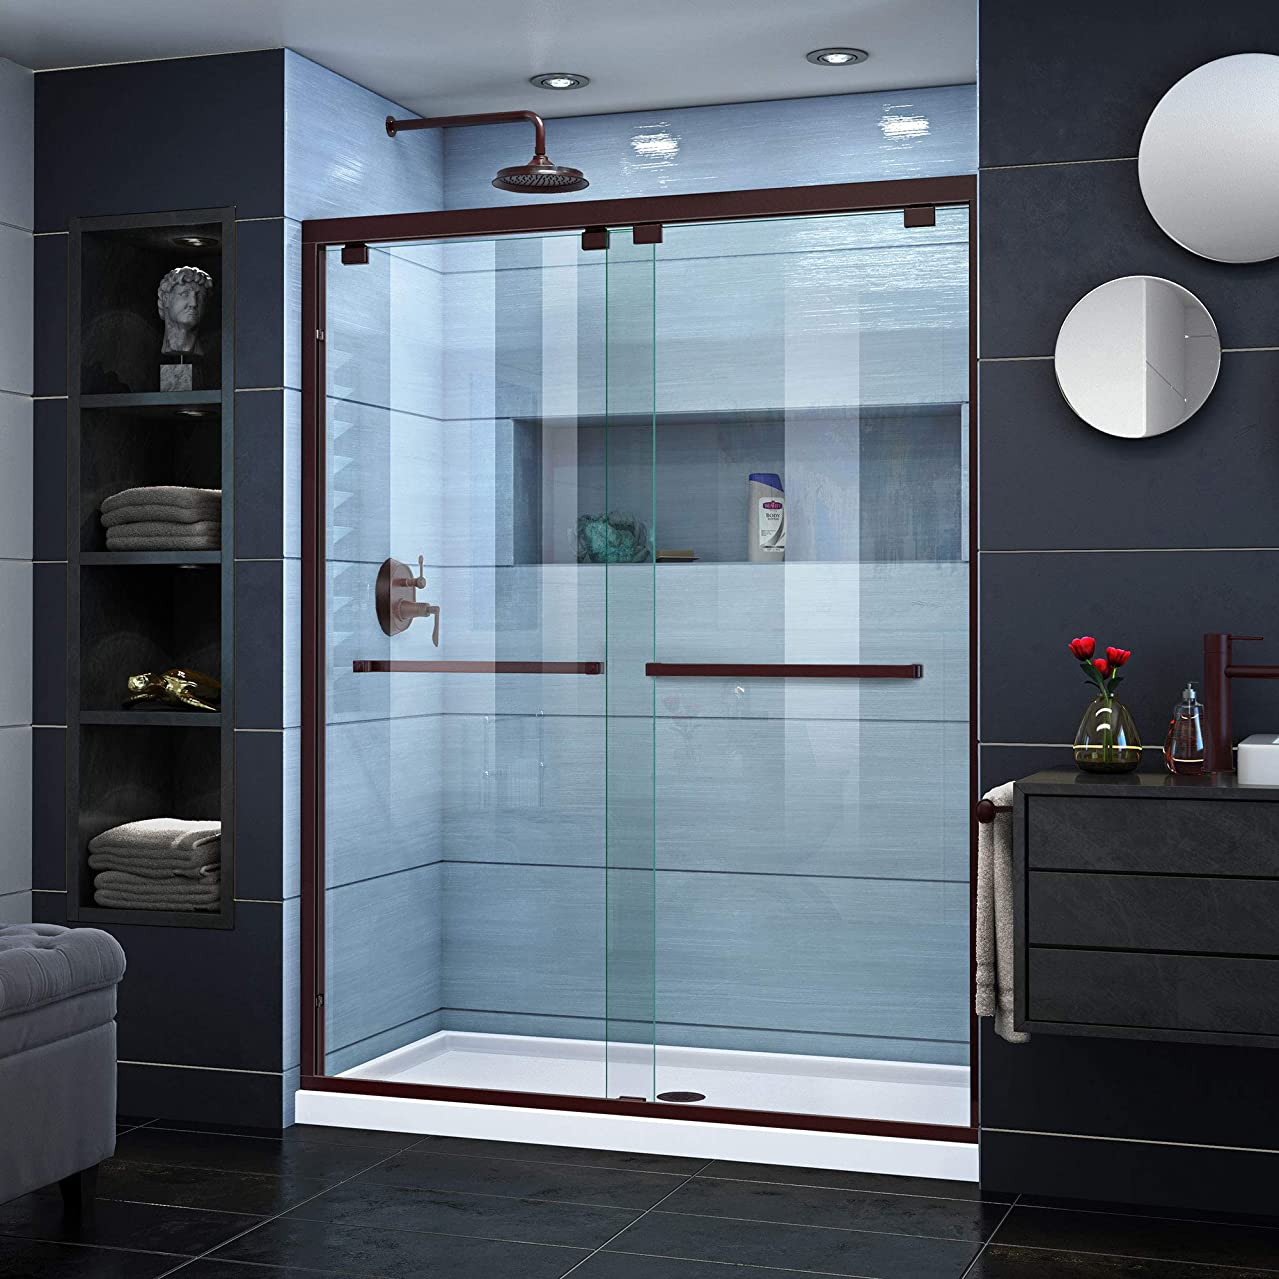 DreamLine Encore 56-60 in. W x 76 in. H Frameless Semi-Frameless Bypass Shower Door in Oil Rubbed Bronze, SHDR-1660760-06